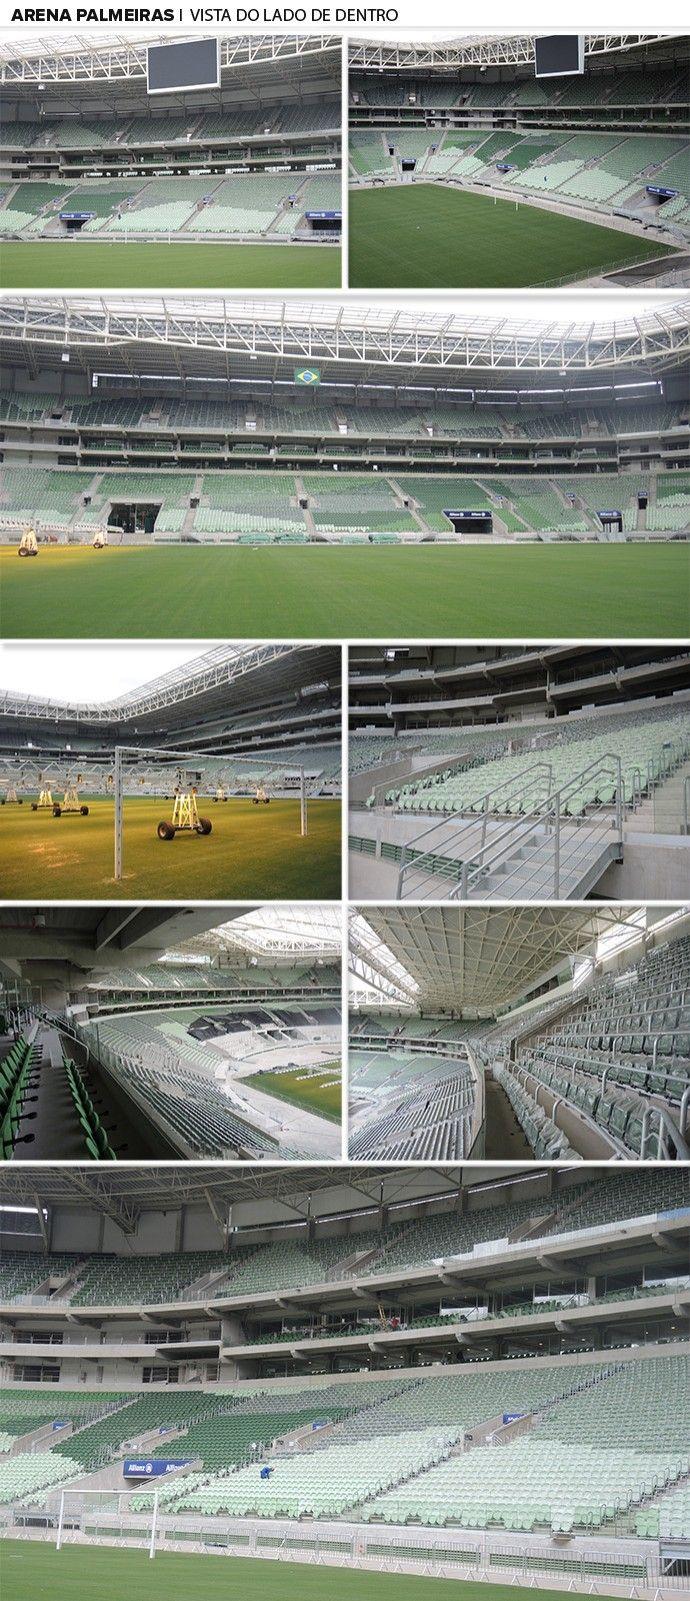 Mosaico - Arena Palmeiras vista por dentro (Foto: Editoria de arte)